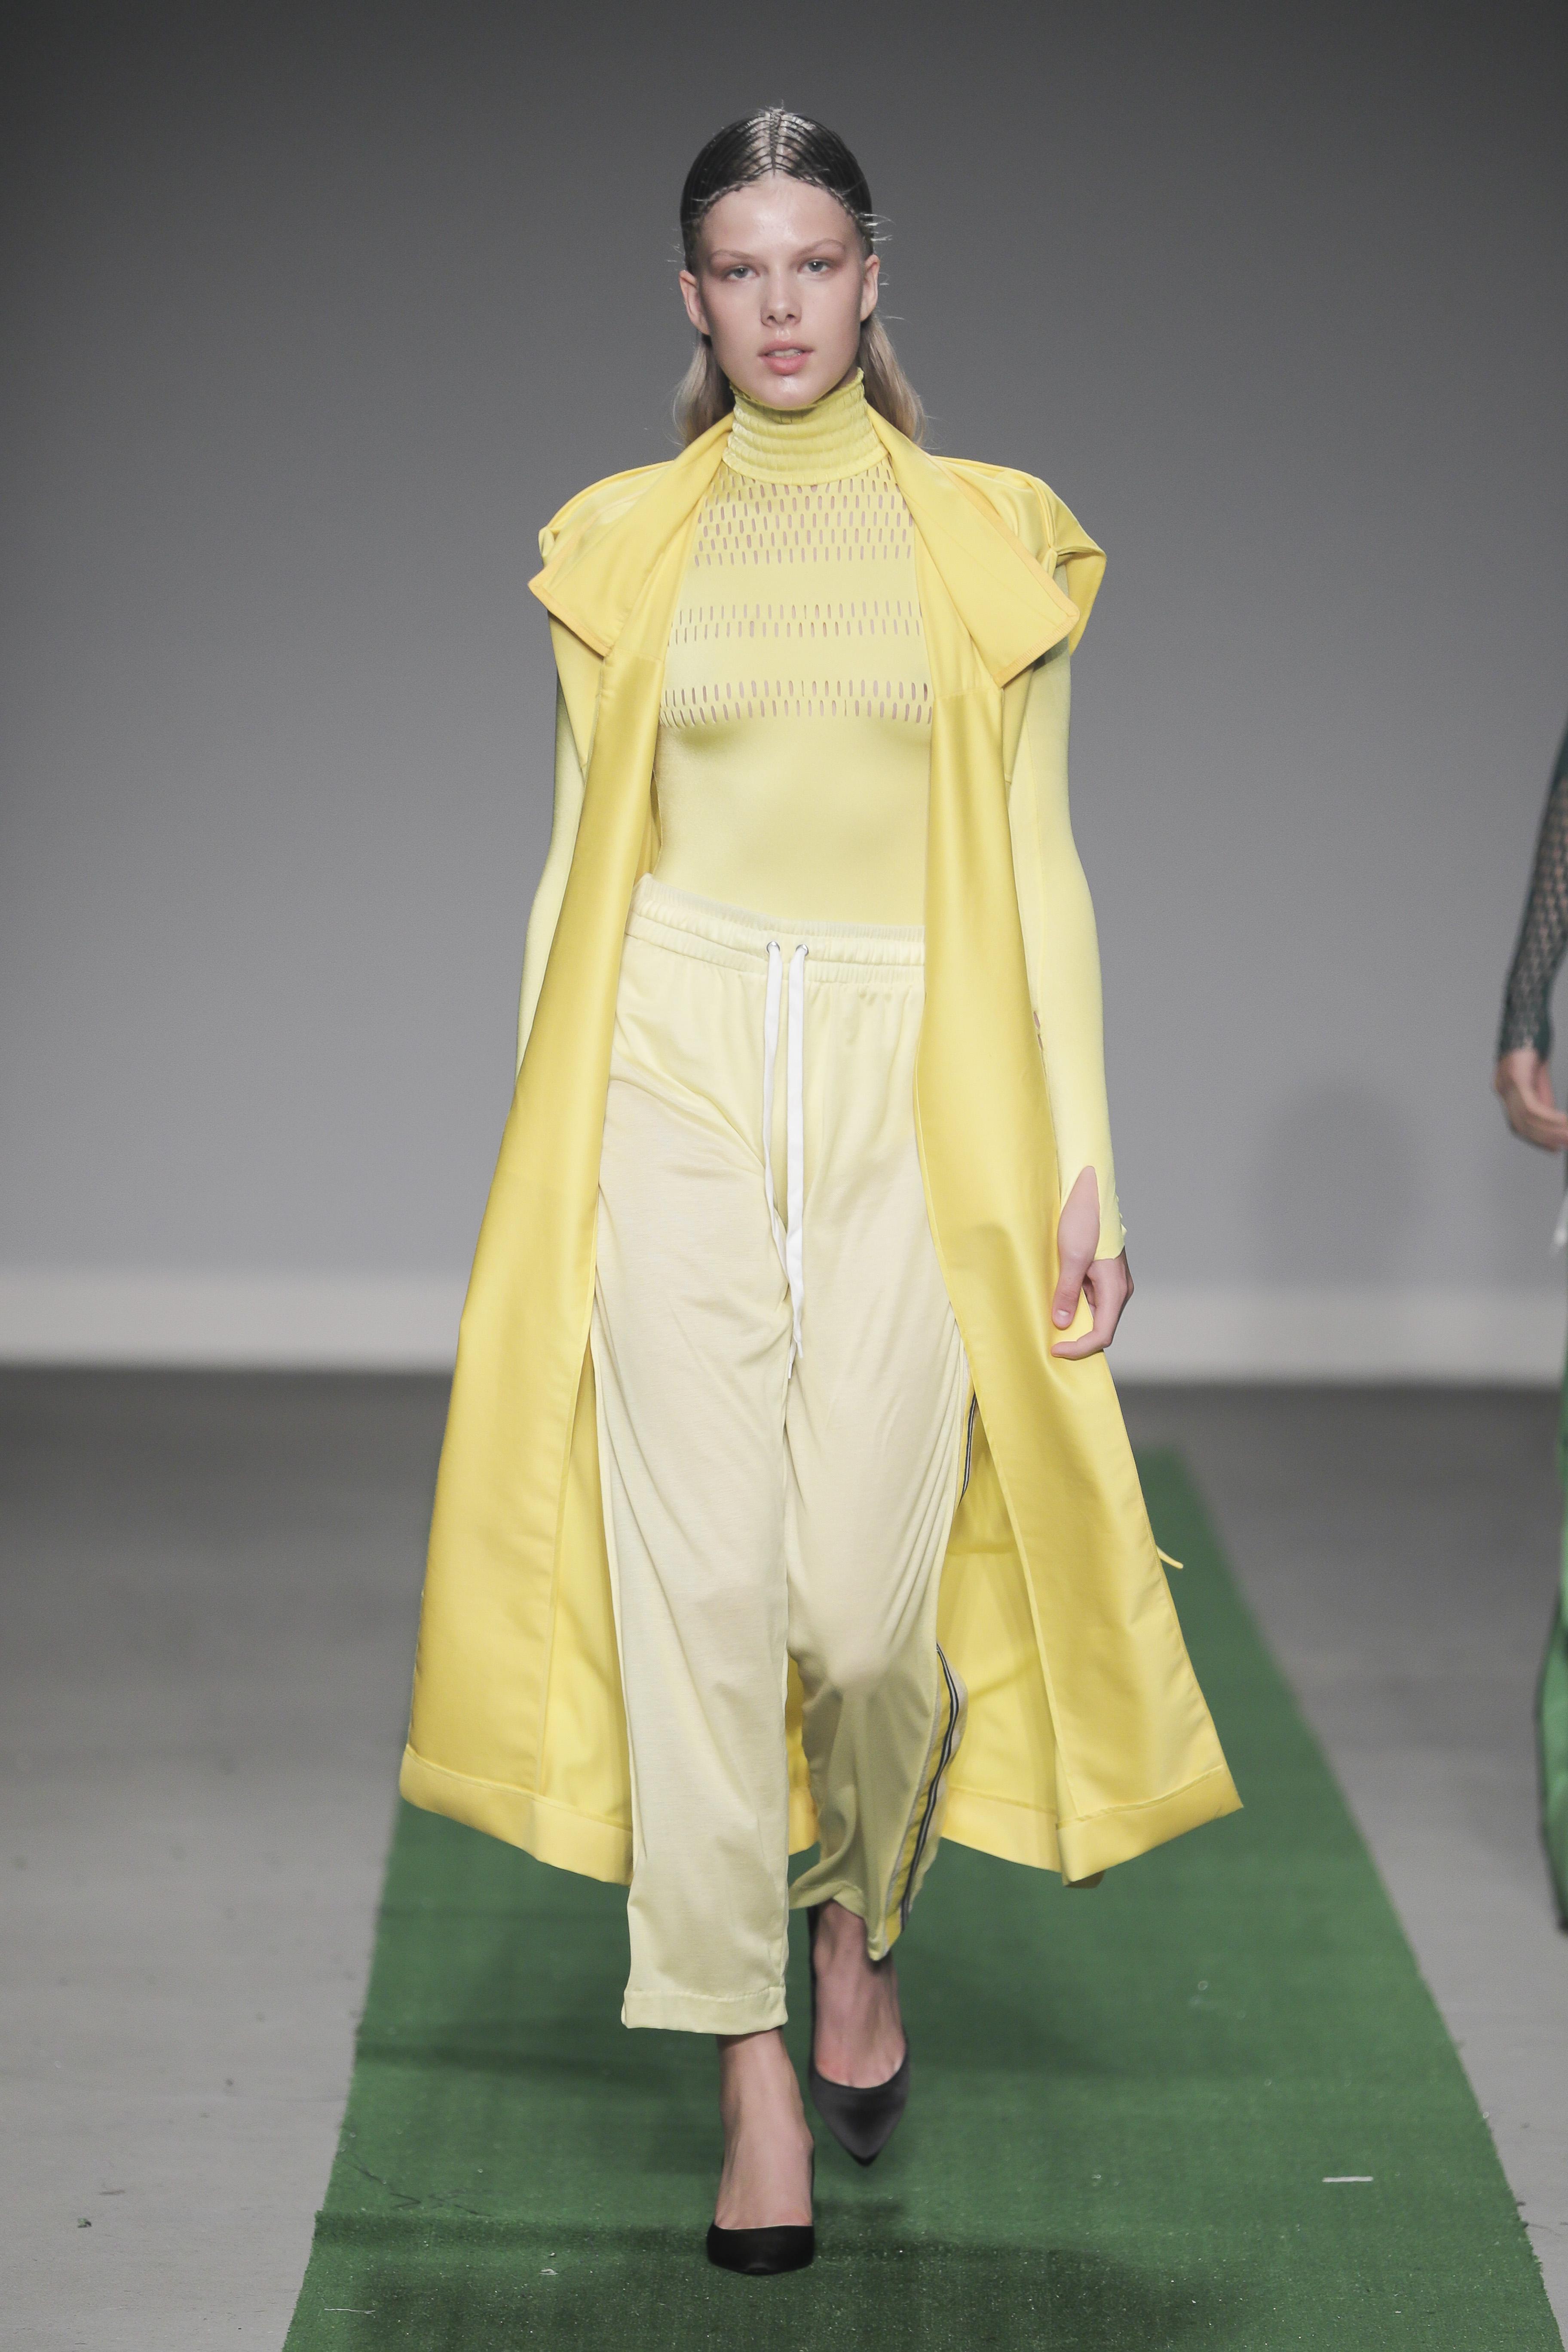 Hoe dit modecollectief op Amsterdam Fashionweek breekt met stereotiepe man-vrouwopvattingen